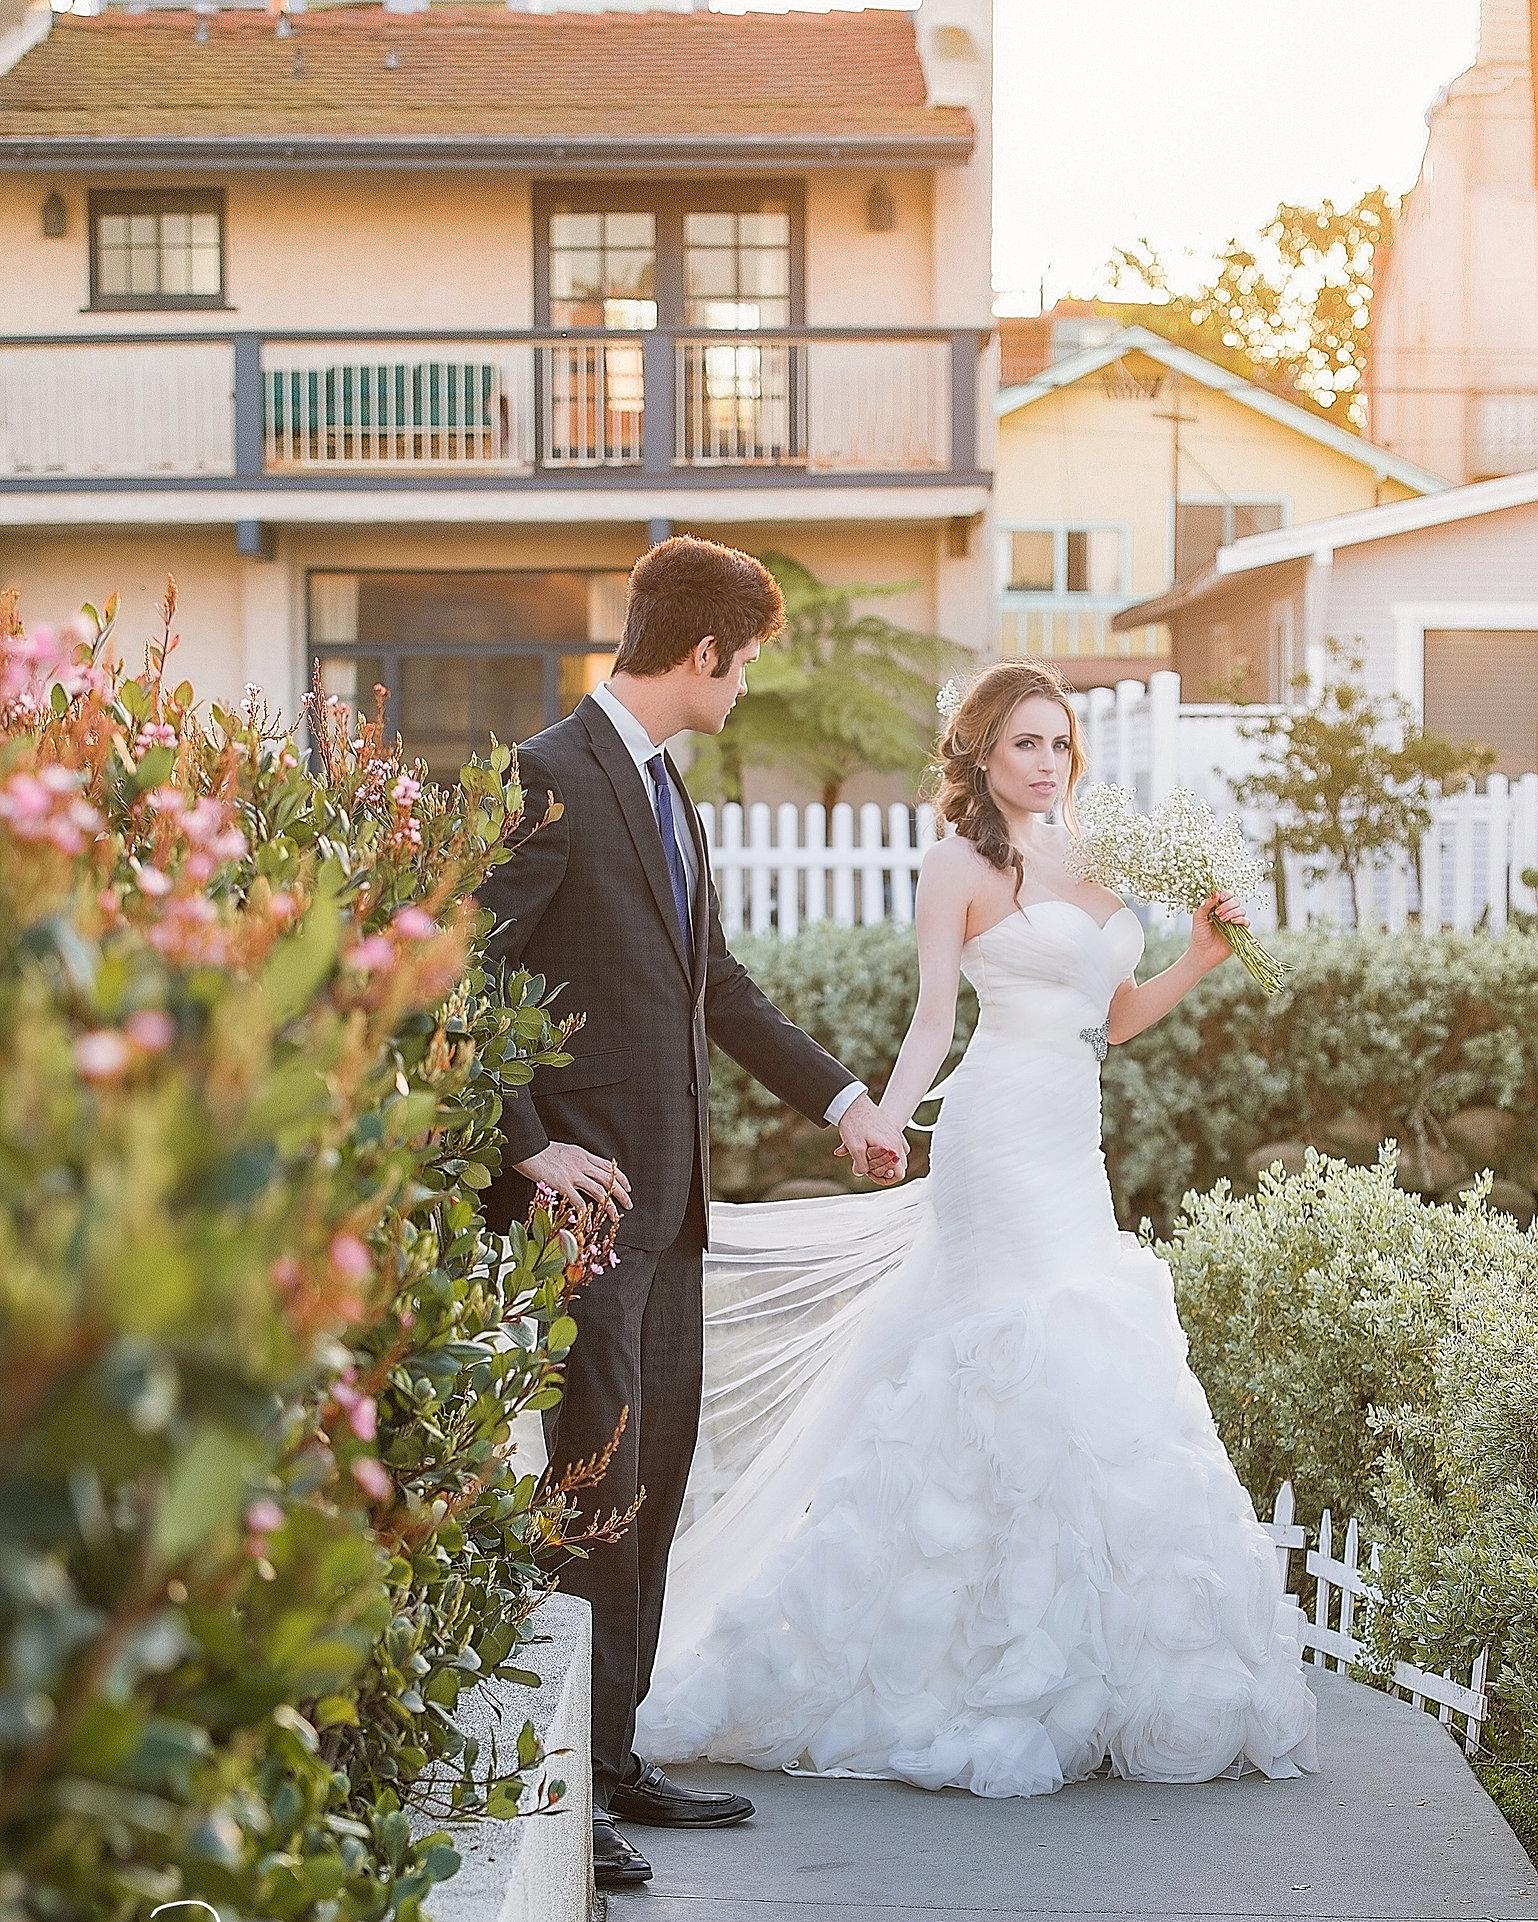 lz bridal designer wedding dress rental